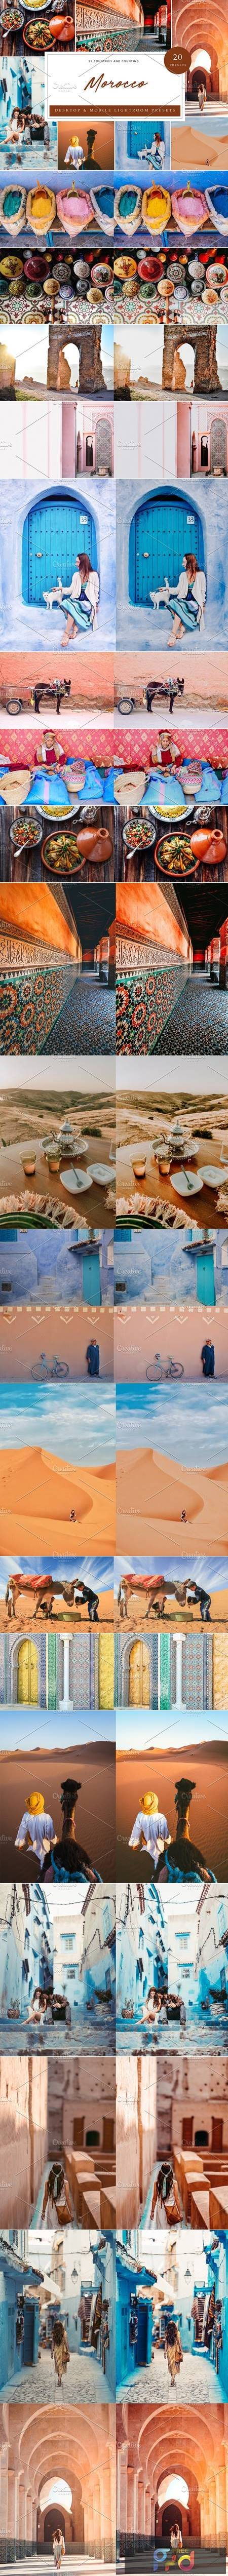 20 x Lightroom Presets, Morocco 5962635 1